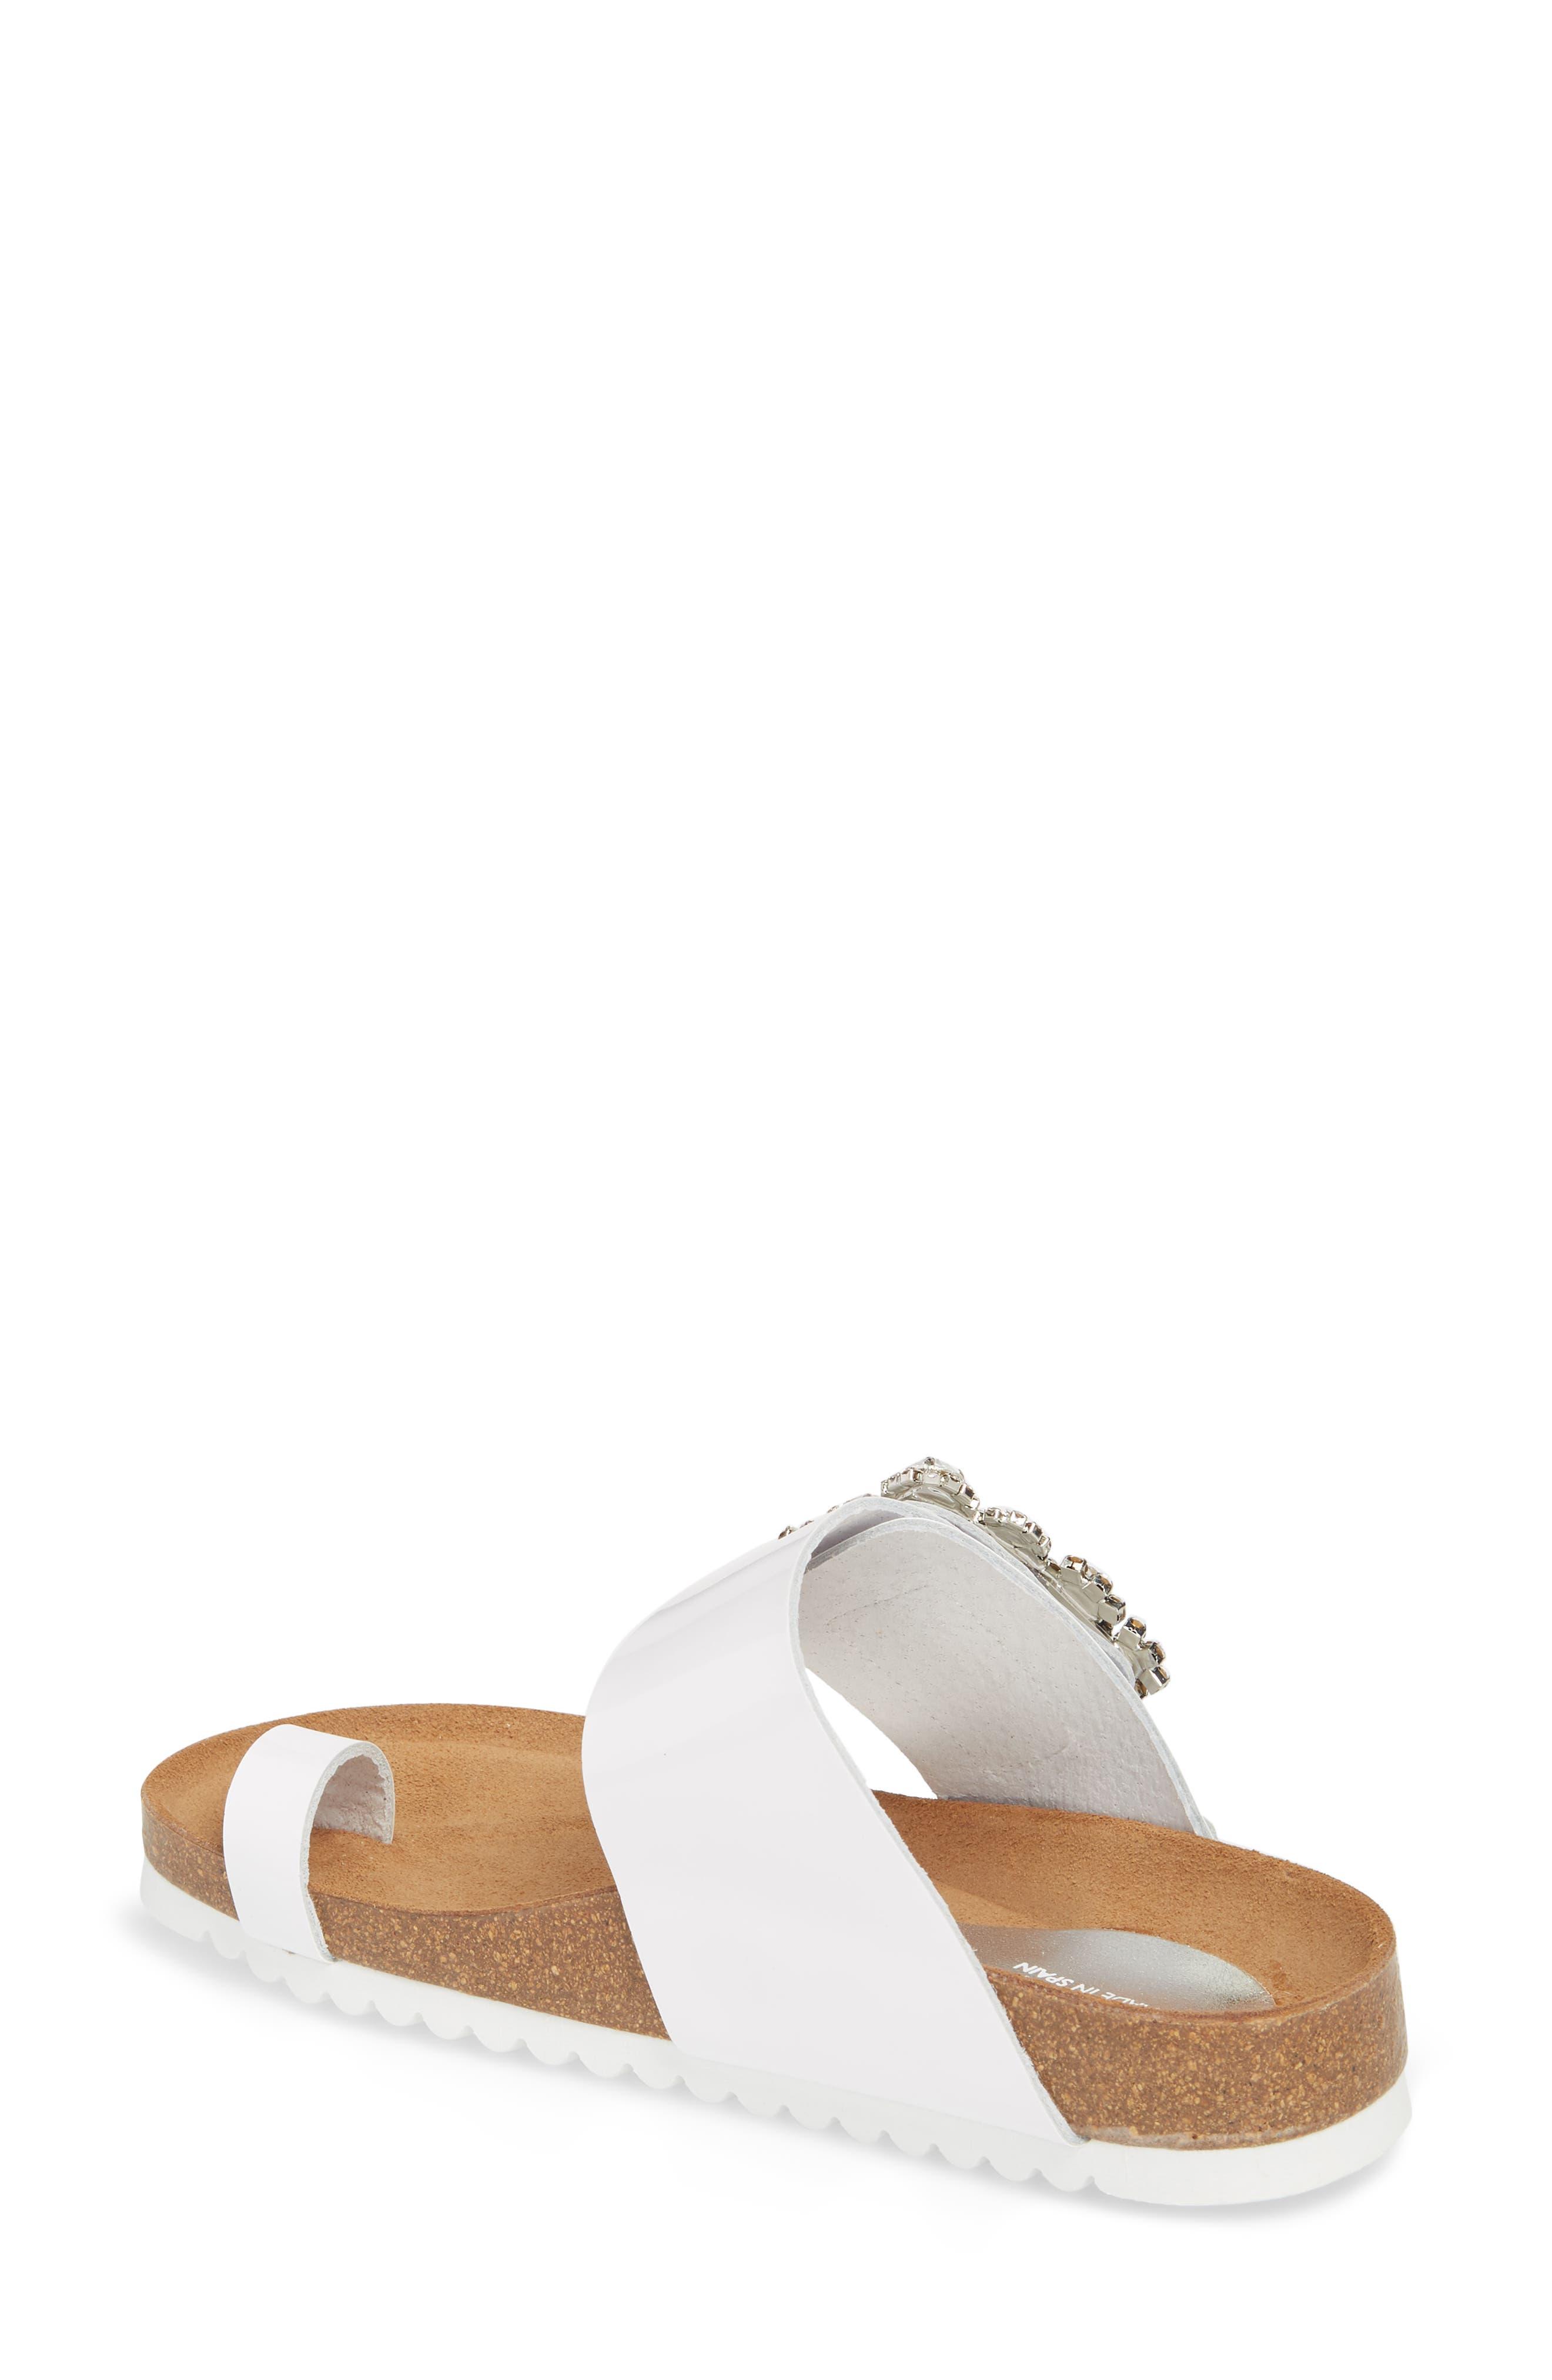 Bianca Embellished Slide Sandal,                             Alternate thumbnail 2, color,                             White Patent/ Silver